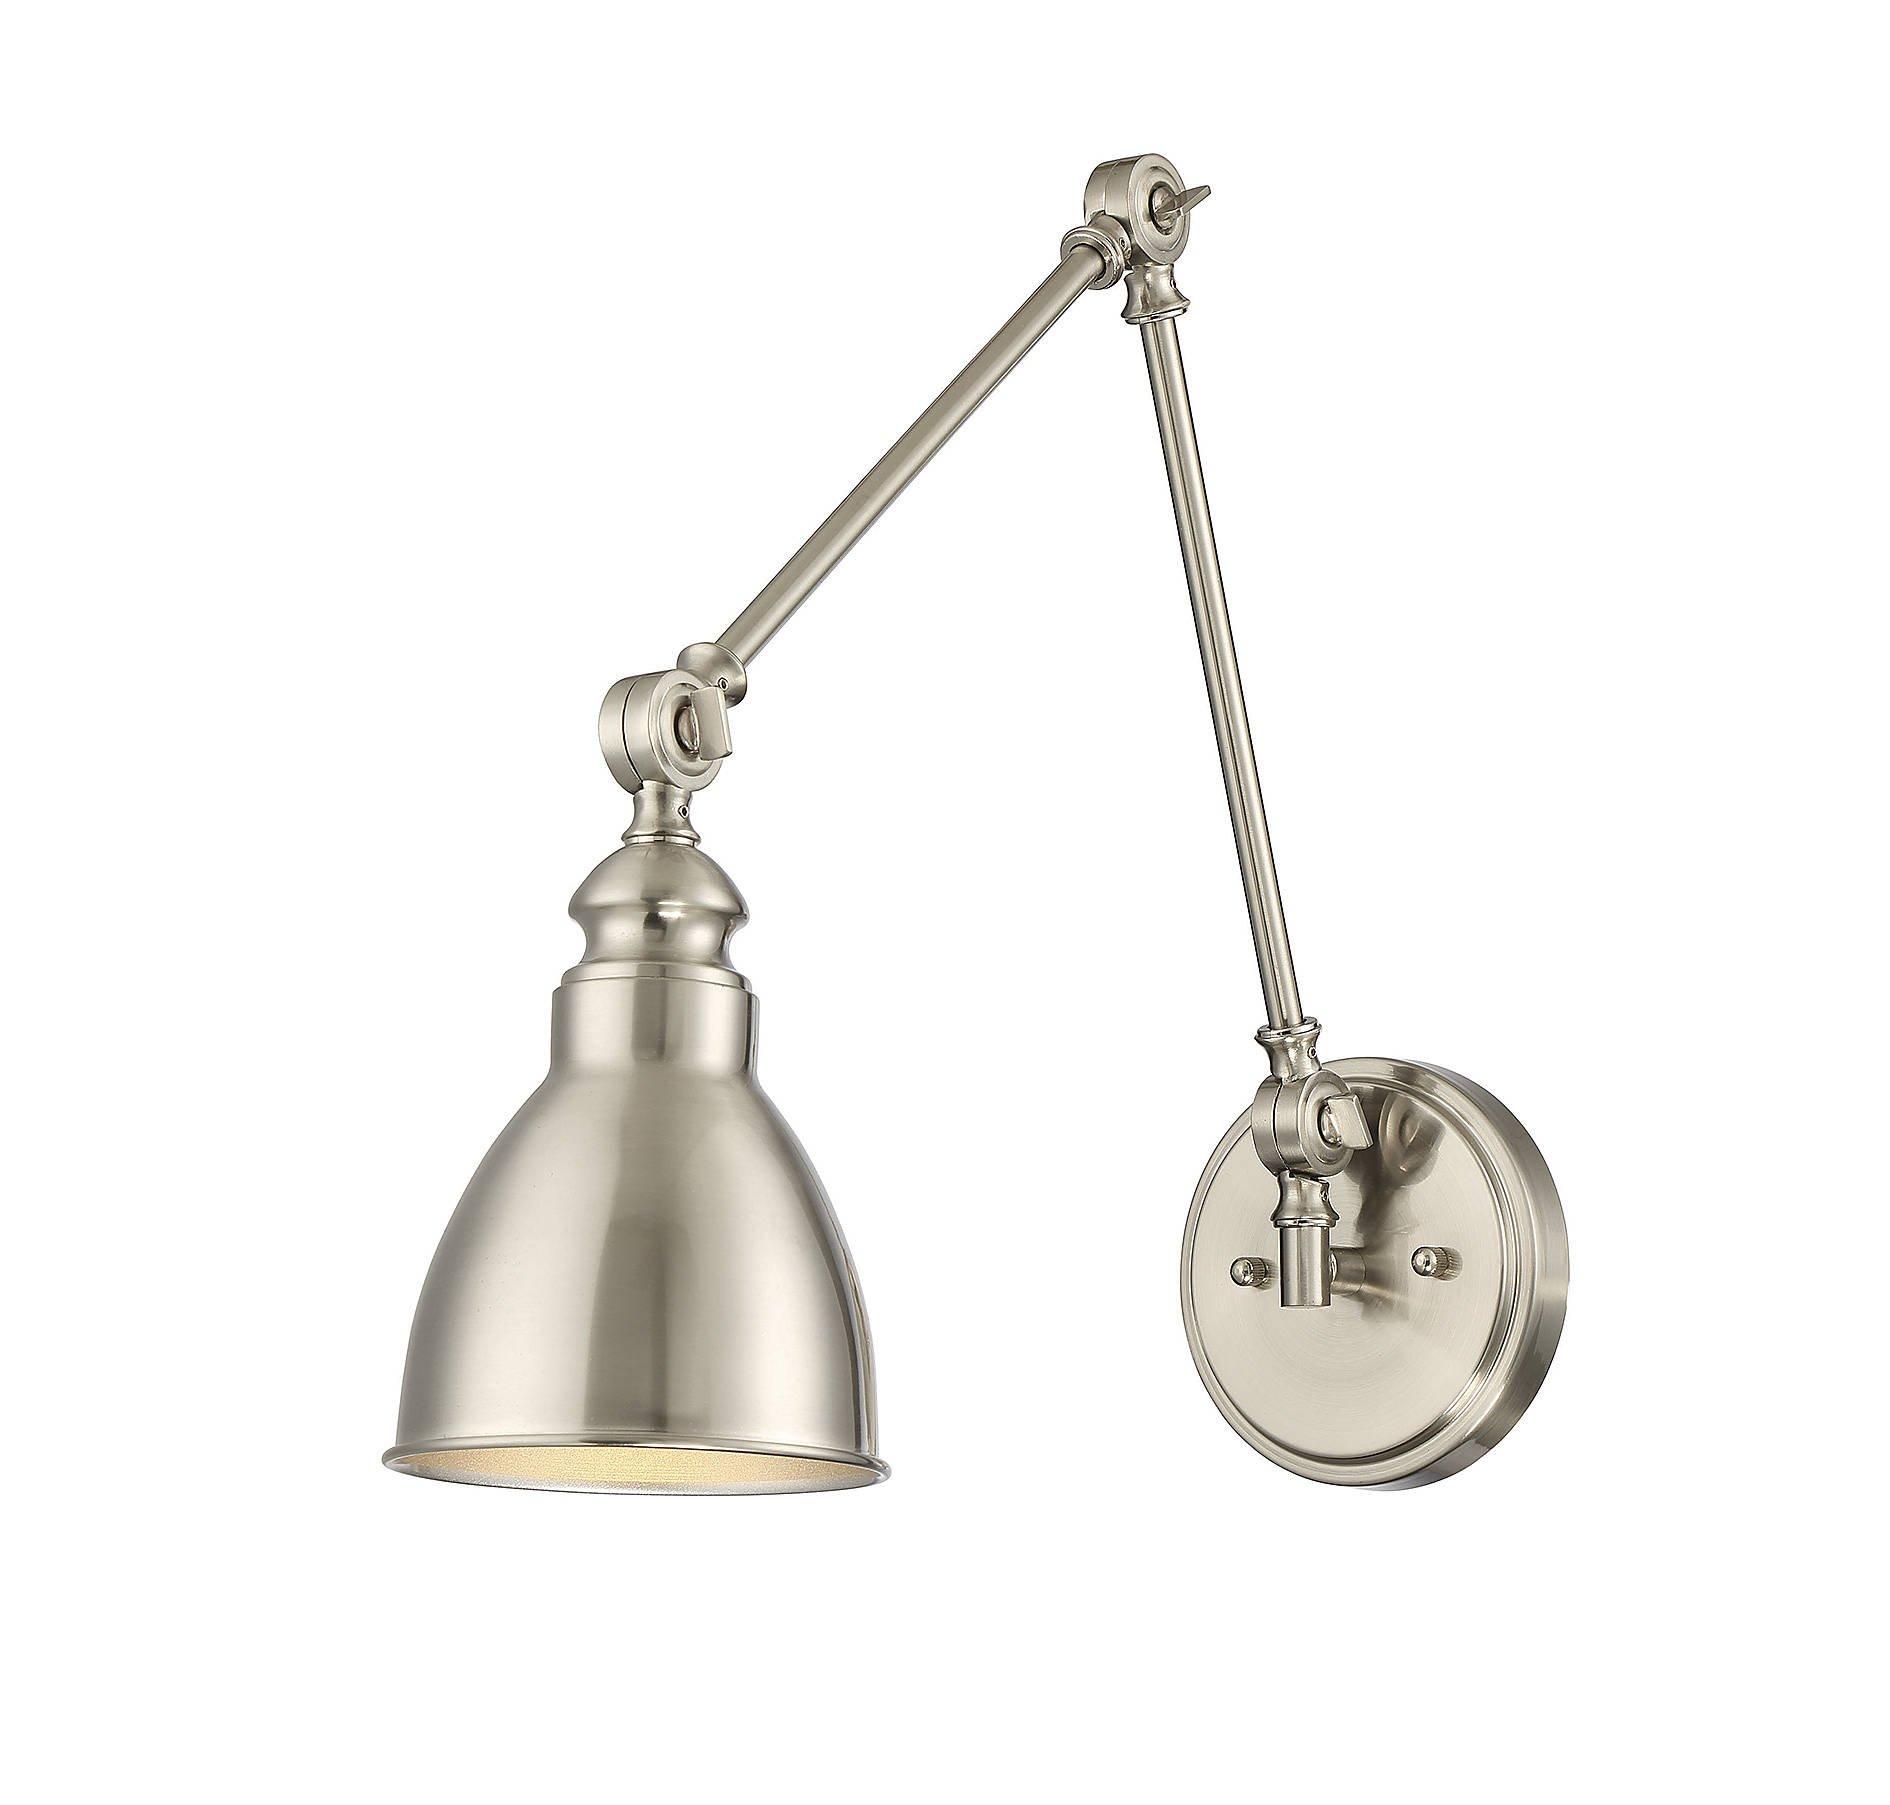 Savoy House Dakota 1-Light Adjustable Wall Lamp in Satin Nickel 9-960-1-SN